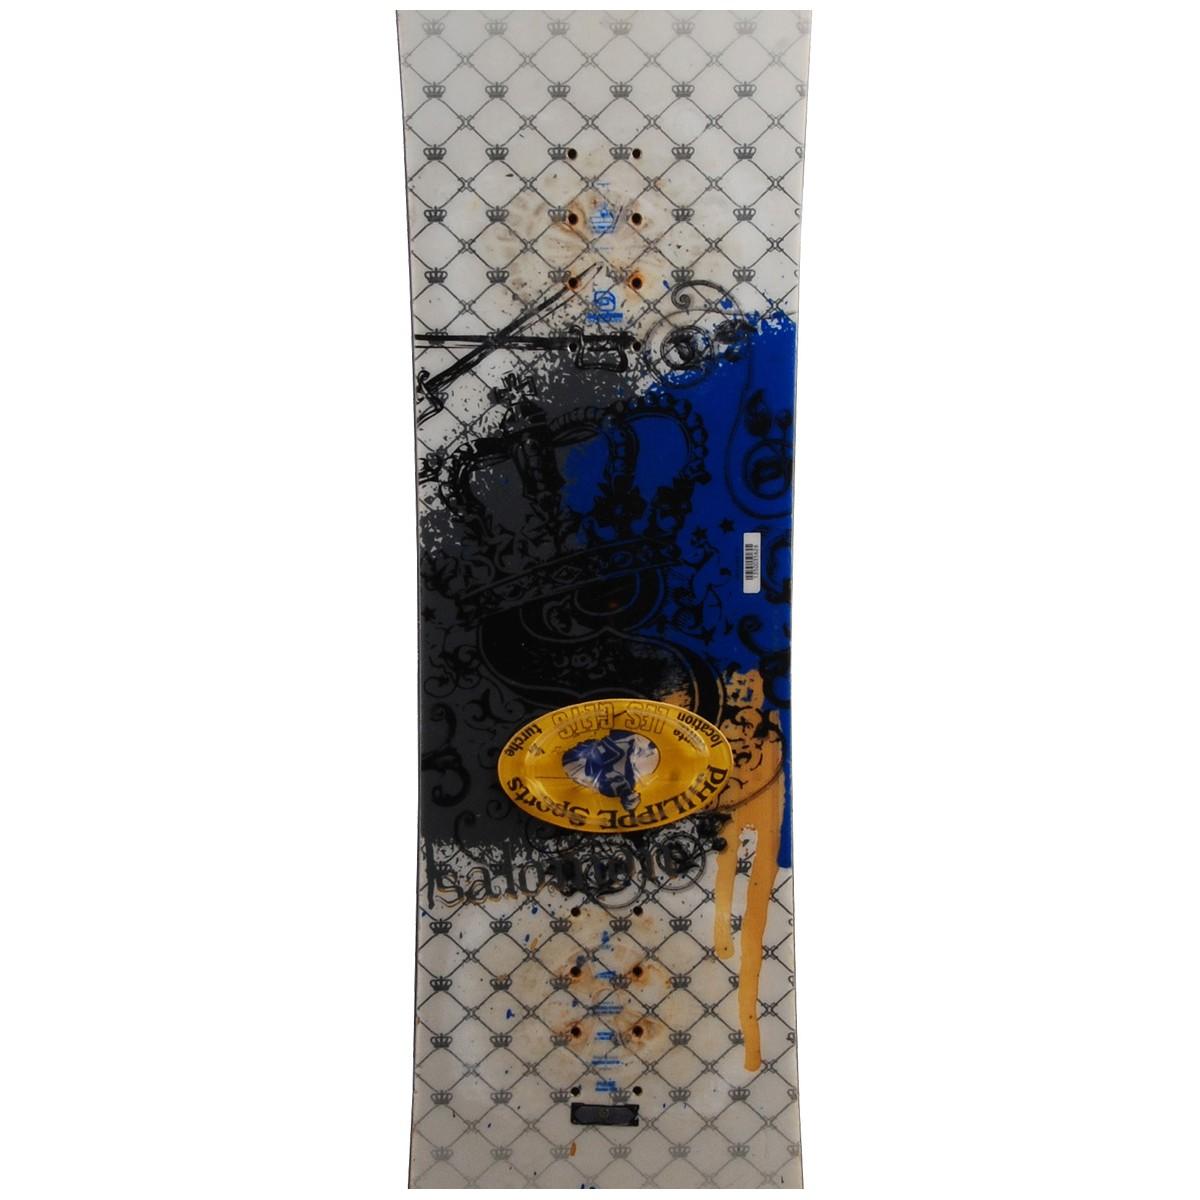 Snowboard-occasion-Salomon-pulse-rtl-fixation miniature 4